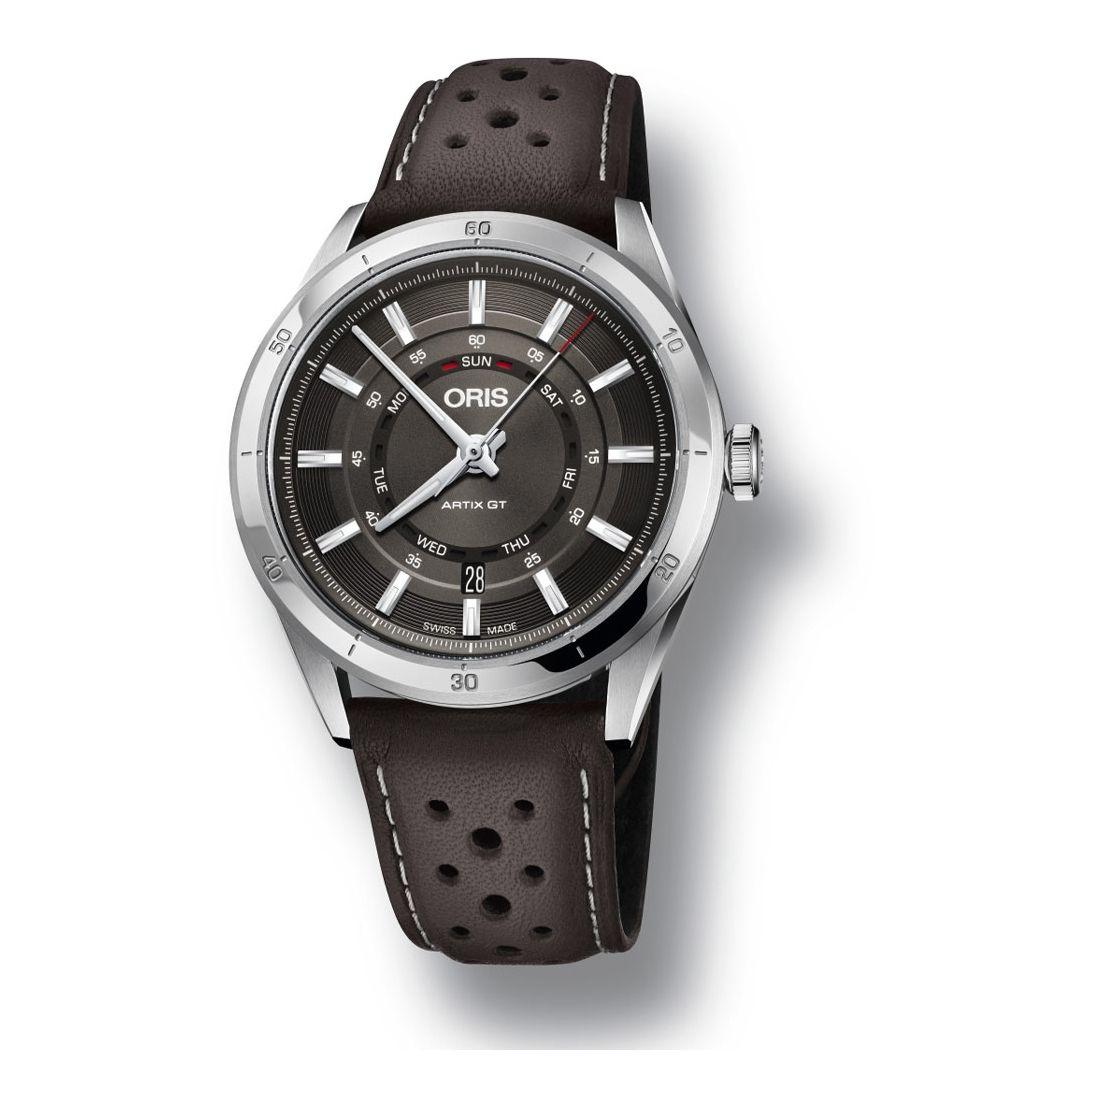 Reloj Oris Artix GT Day Date - 01 735 7751 4153-07 5 21 09FC  - 1